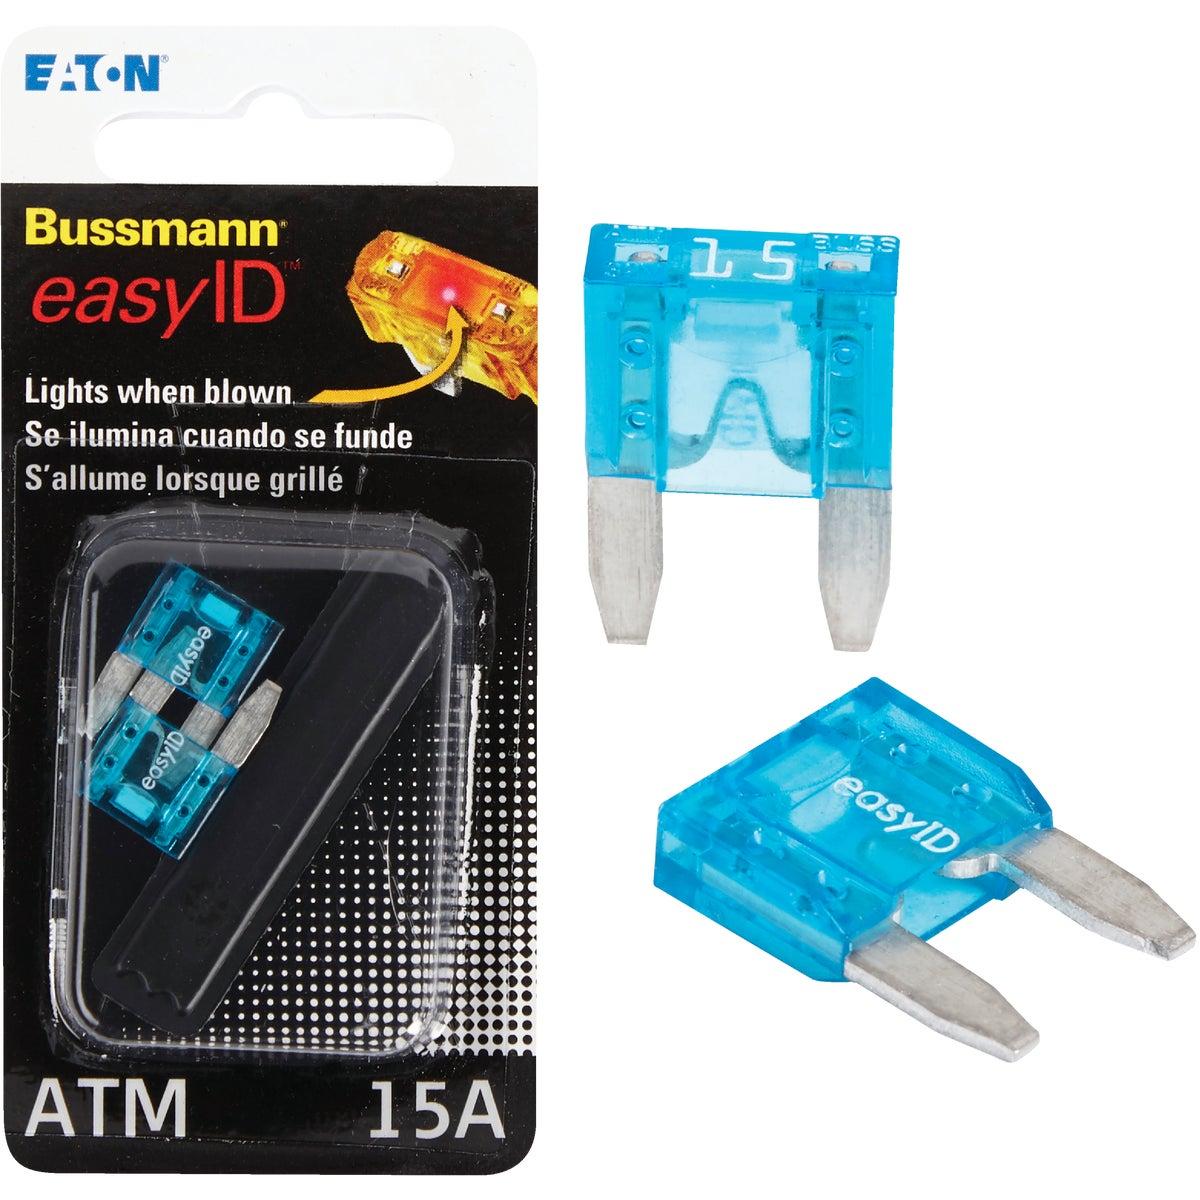 2PK 15A ATM EASY ID FUSE - BP/ATM-15ID by Bussmann Cooper